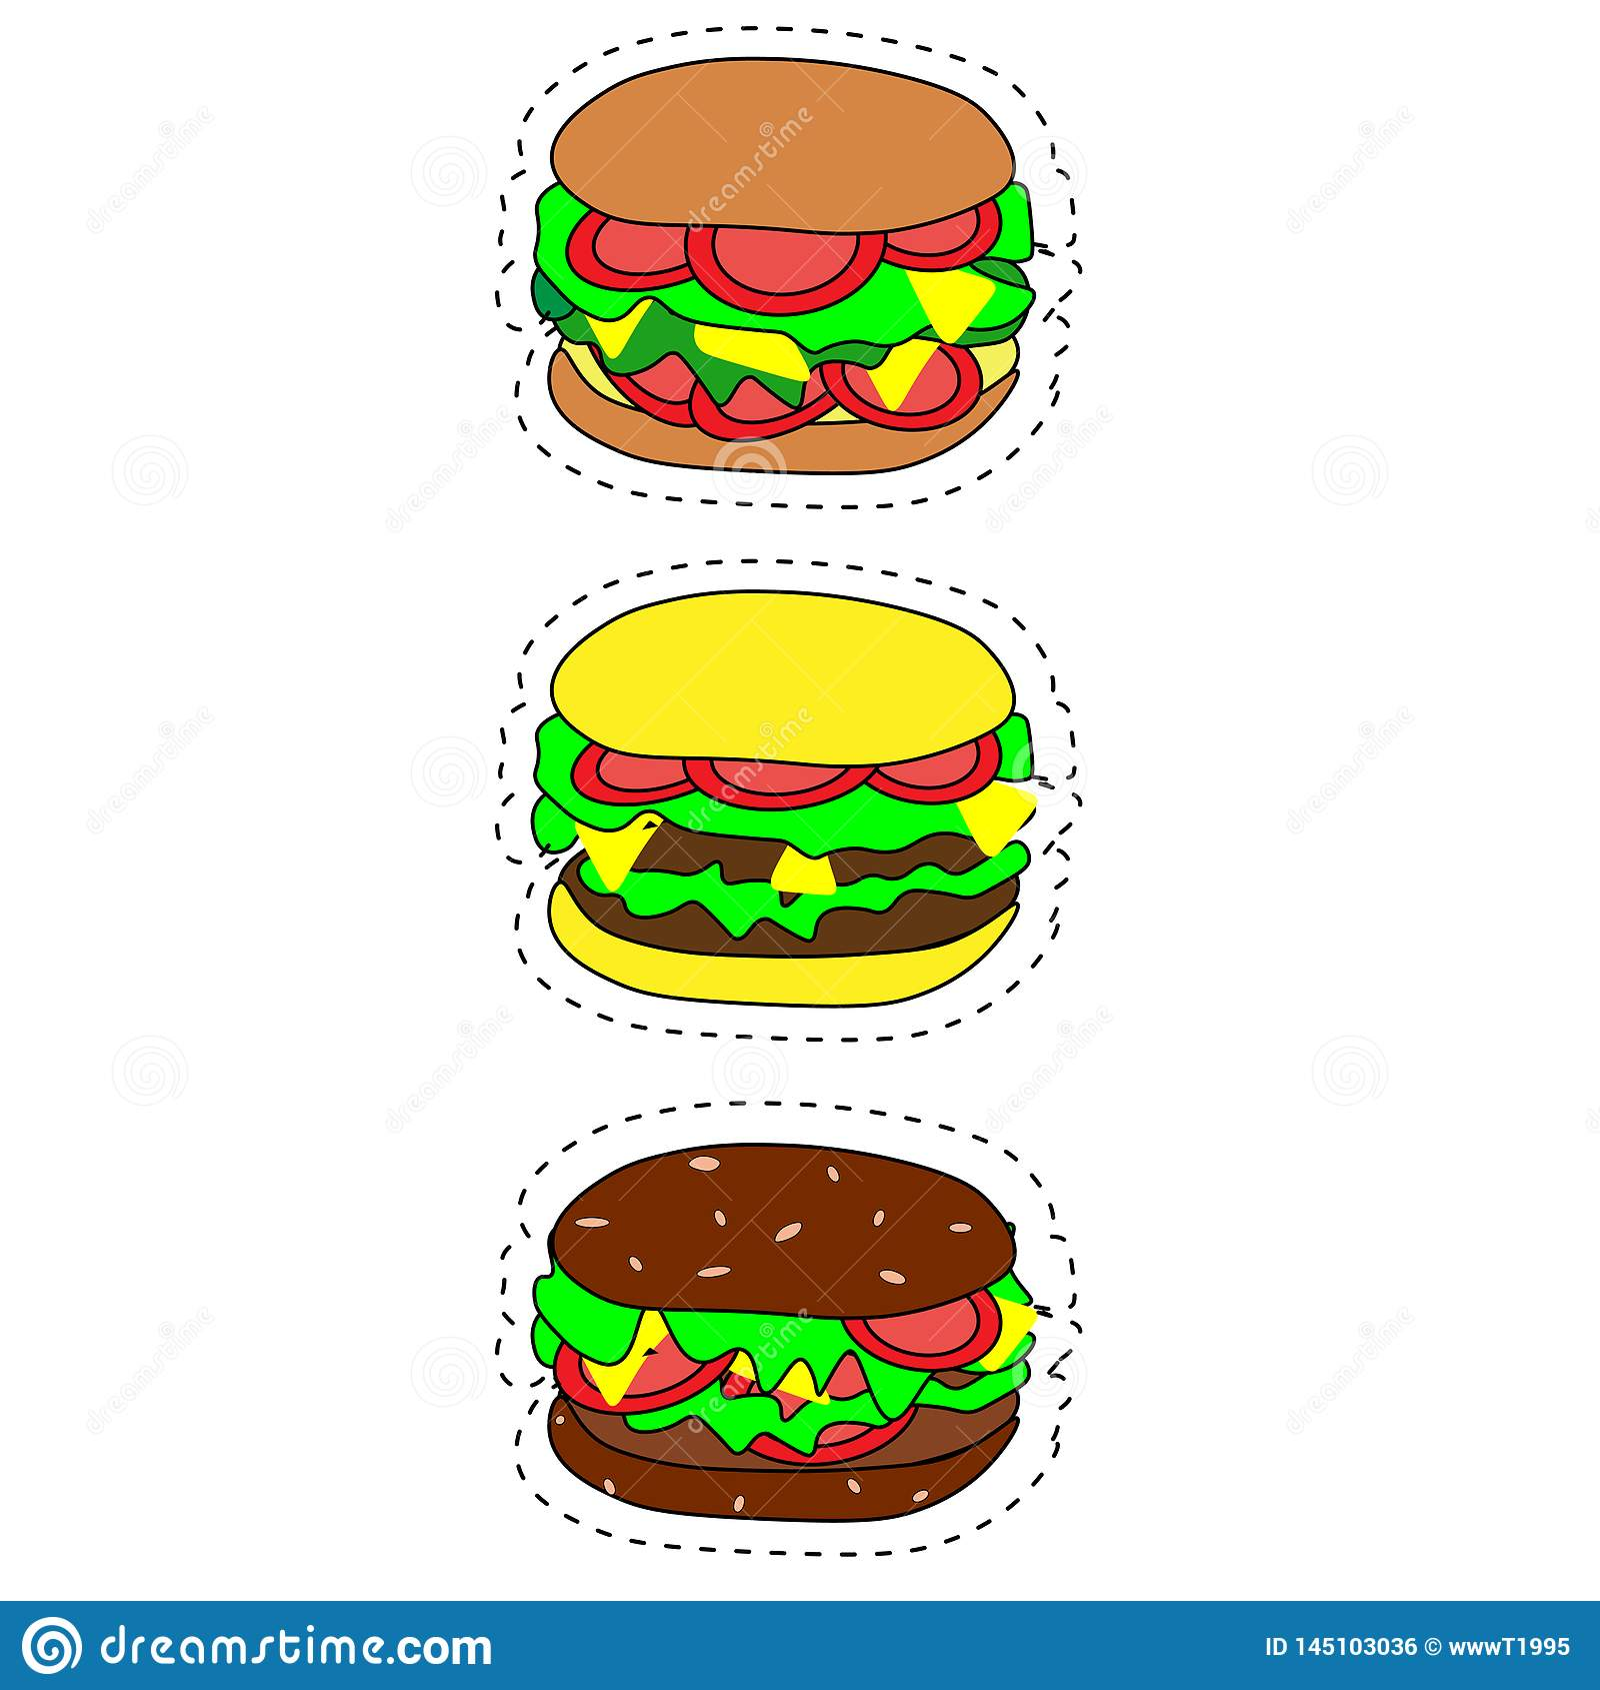 Grupo de ?cones do fast food do vetor Hamburger, cheeseburger, hamburguer dobro, hamburguer com alface, cebola, tomate, pepino e